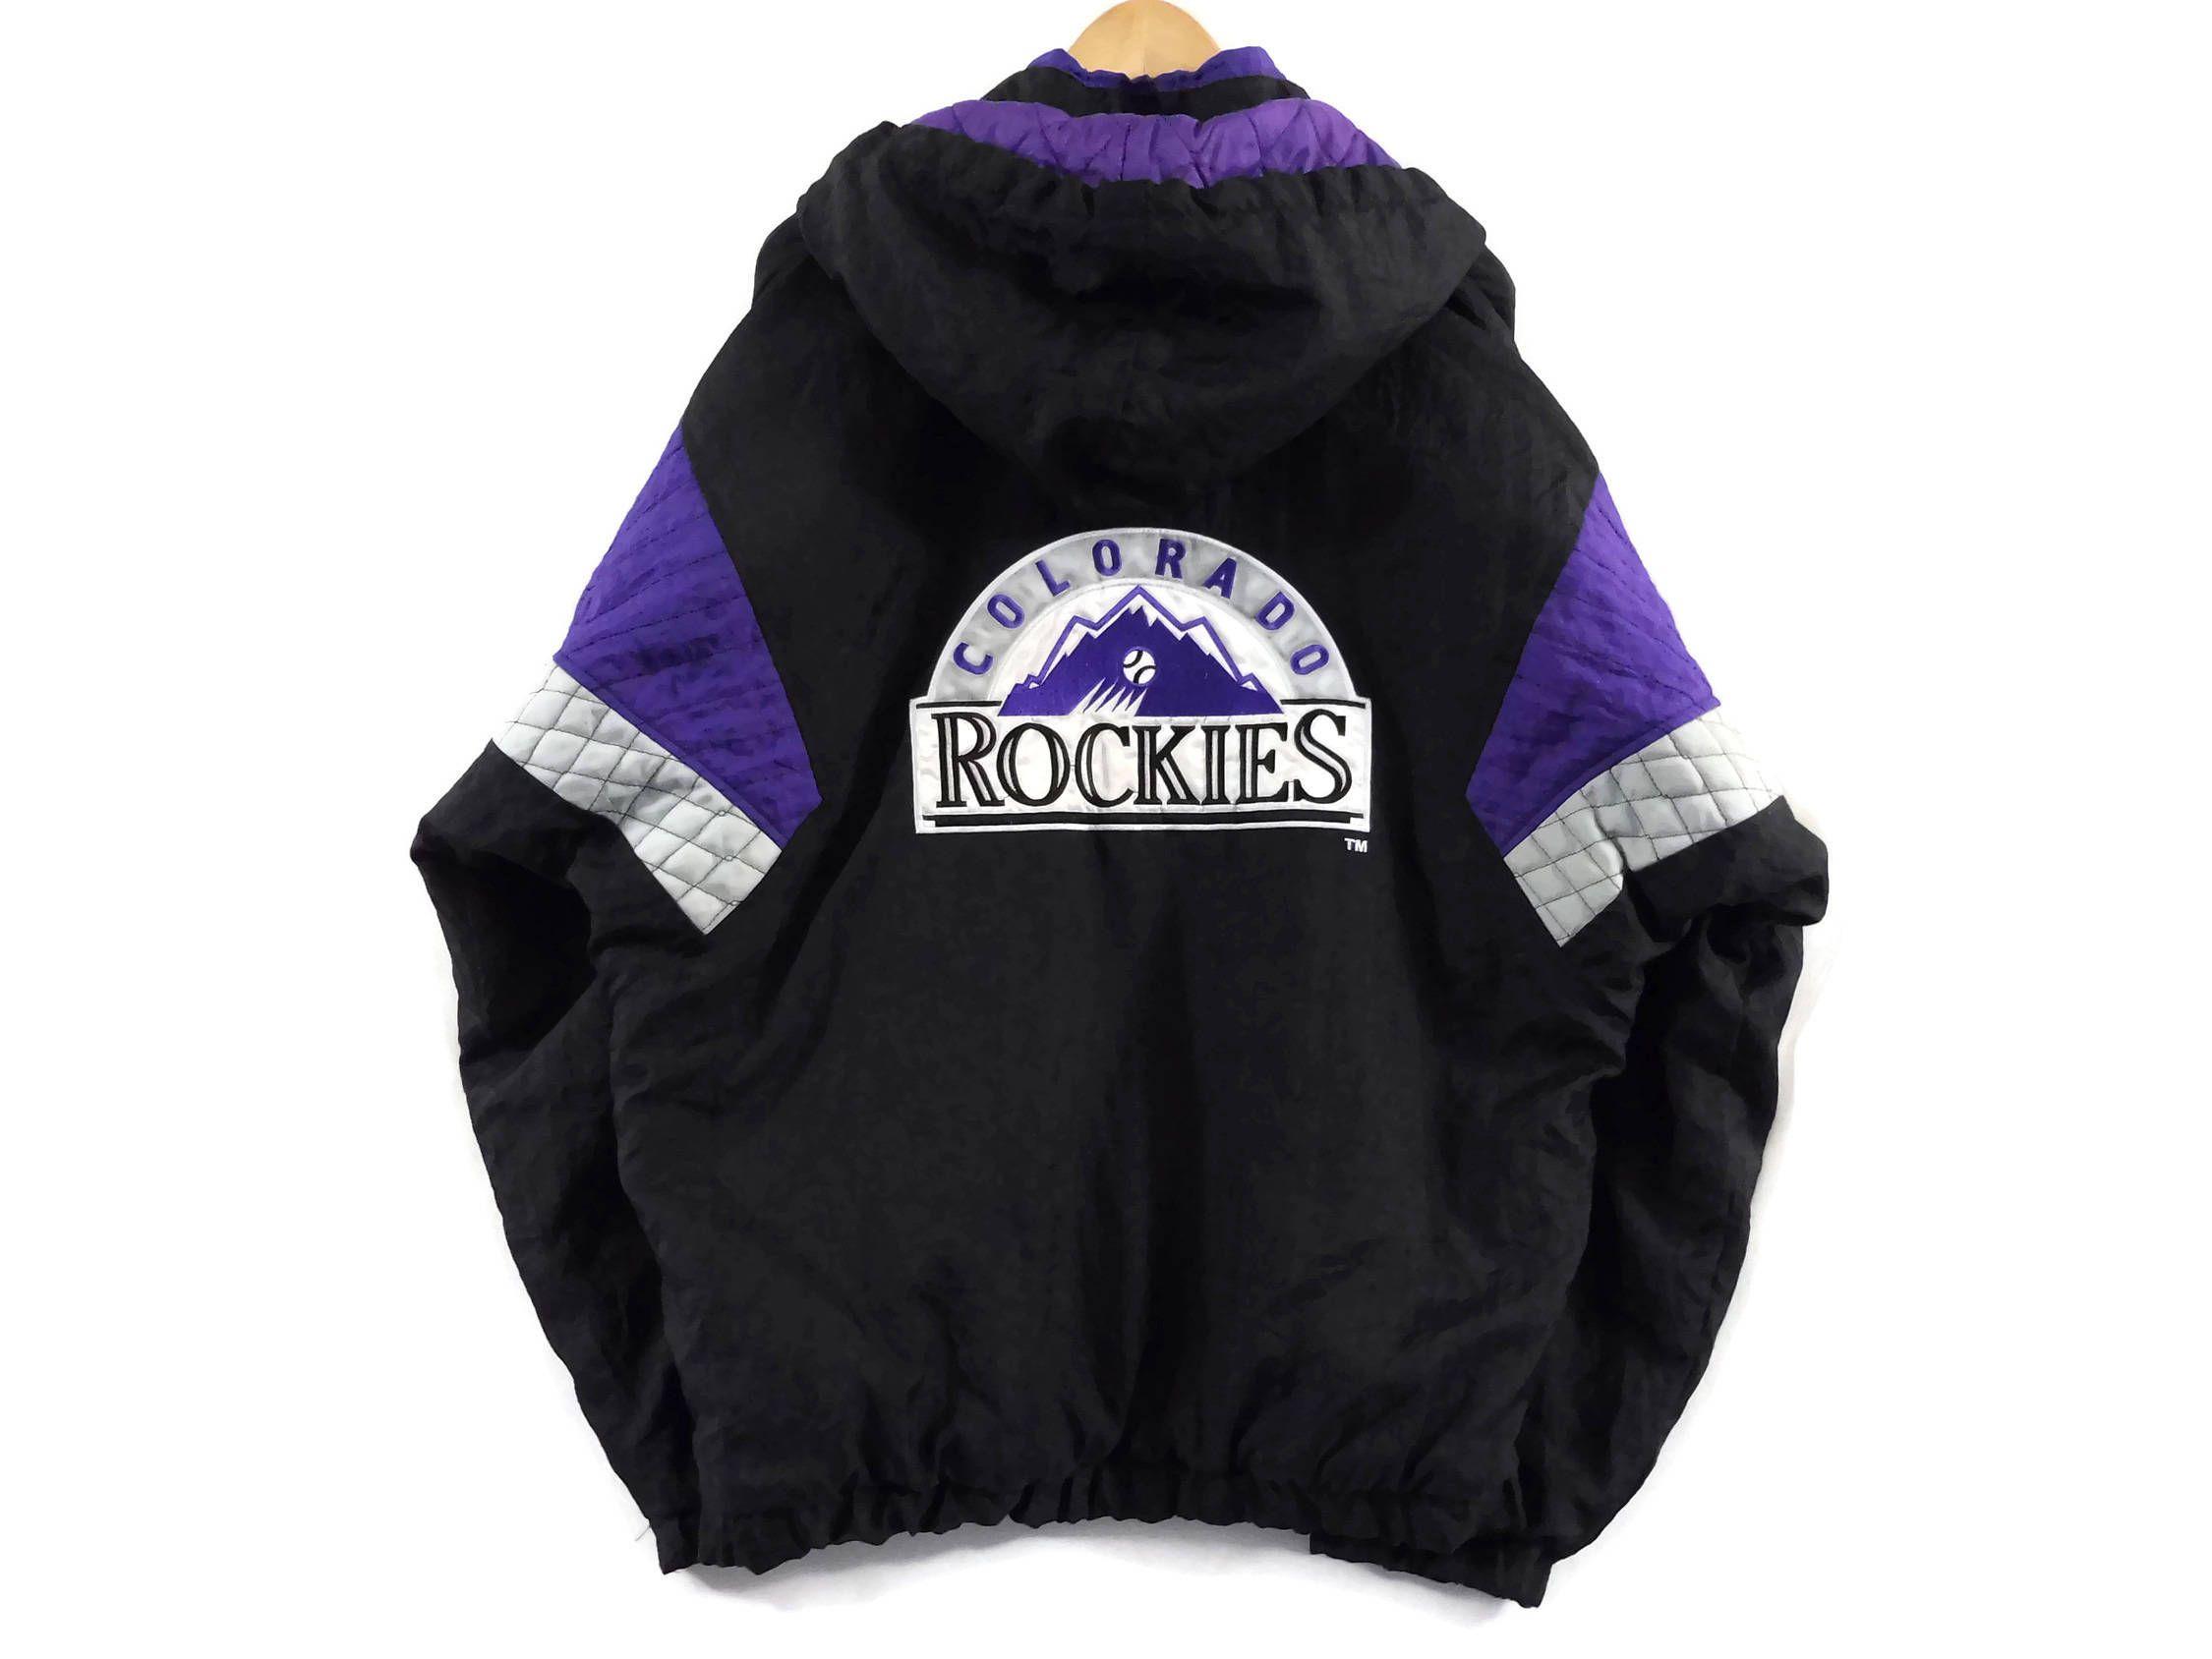 the best attitude 7cc74 7382f VTG Colorado Rockies Starter Jacket - Large - Hooded - MLB ...